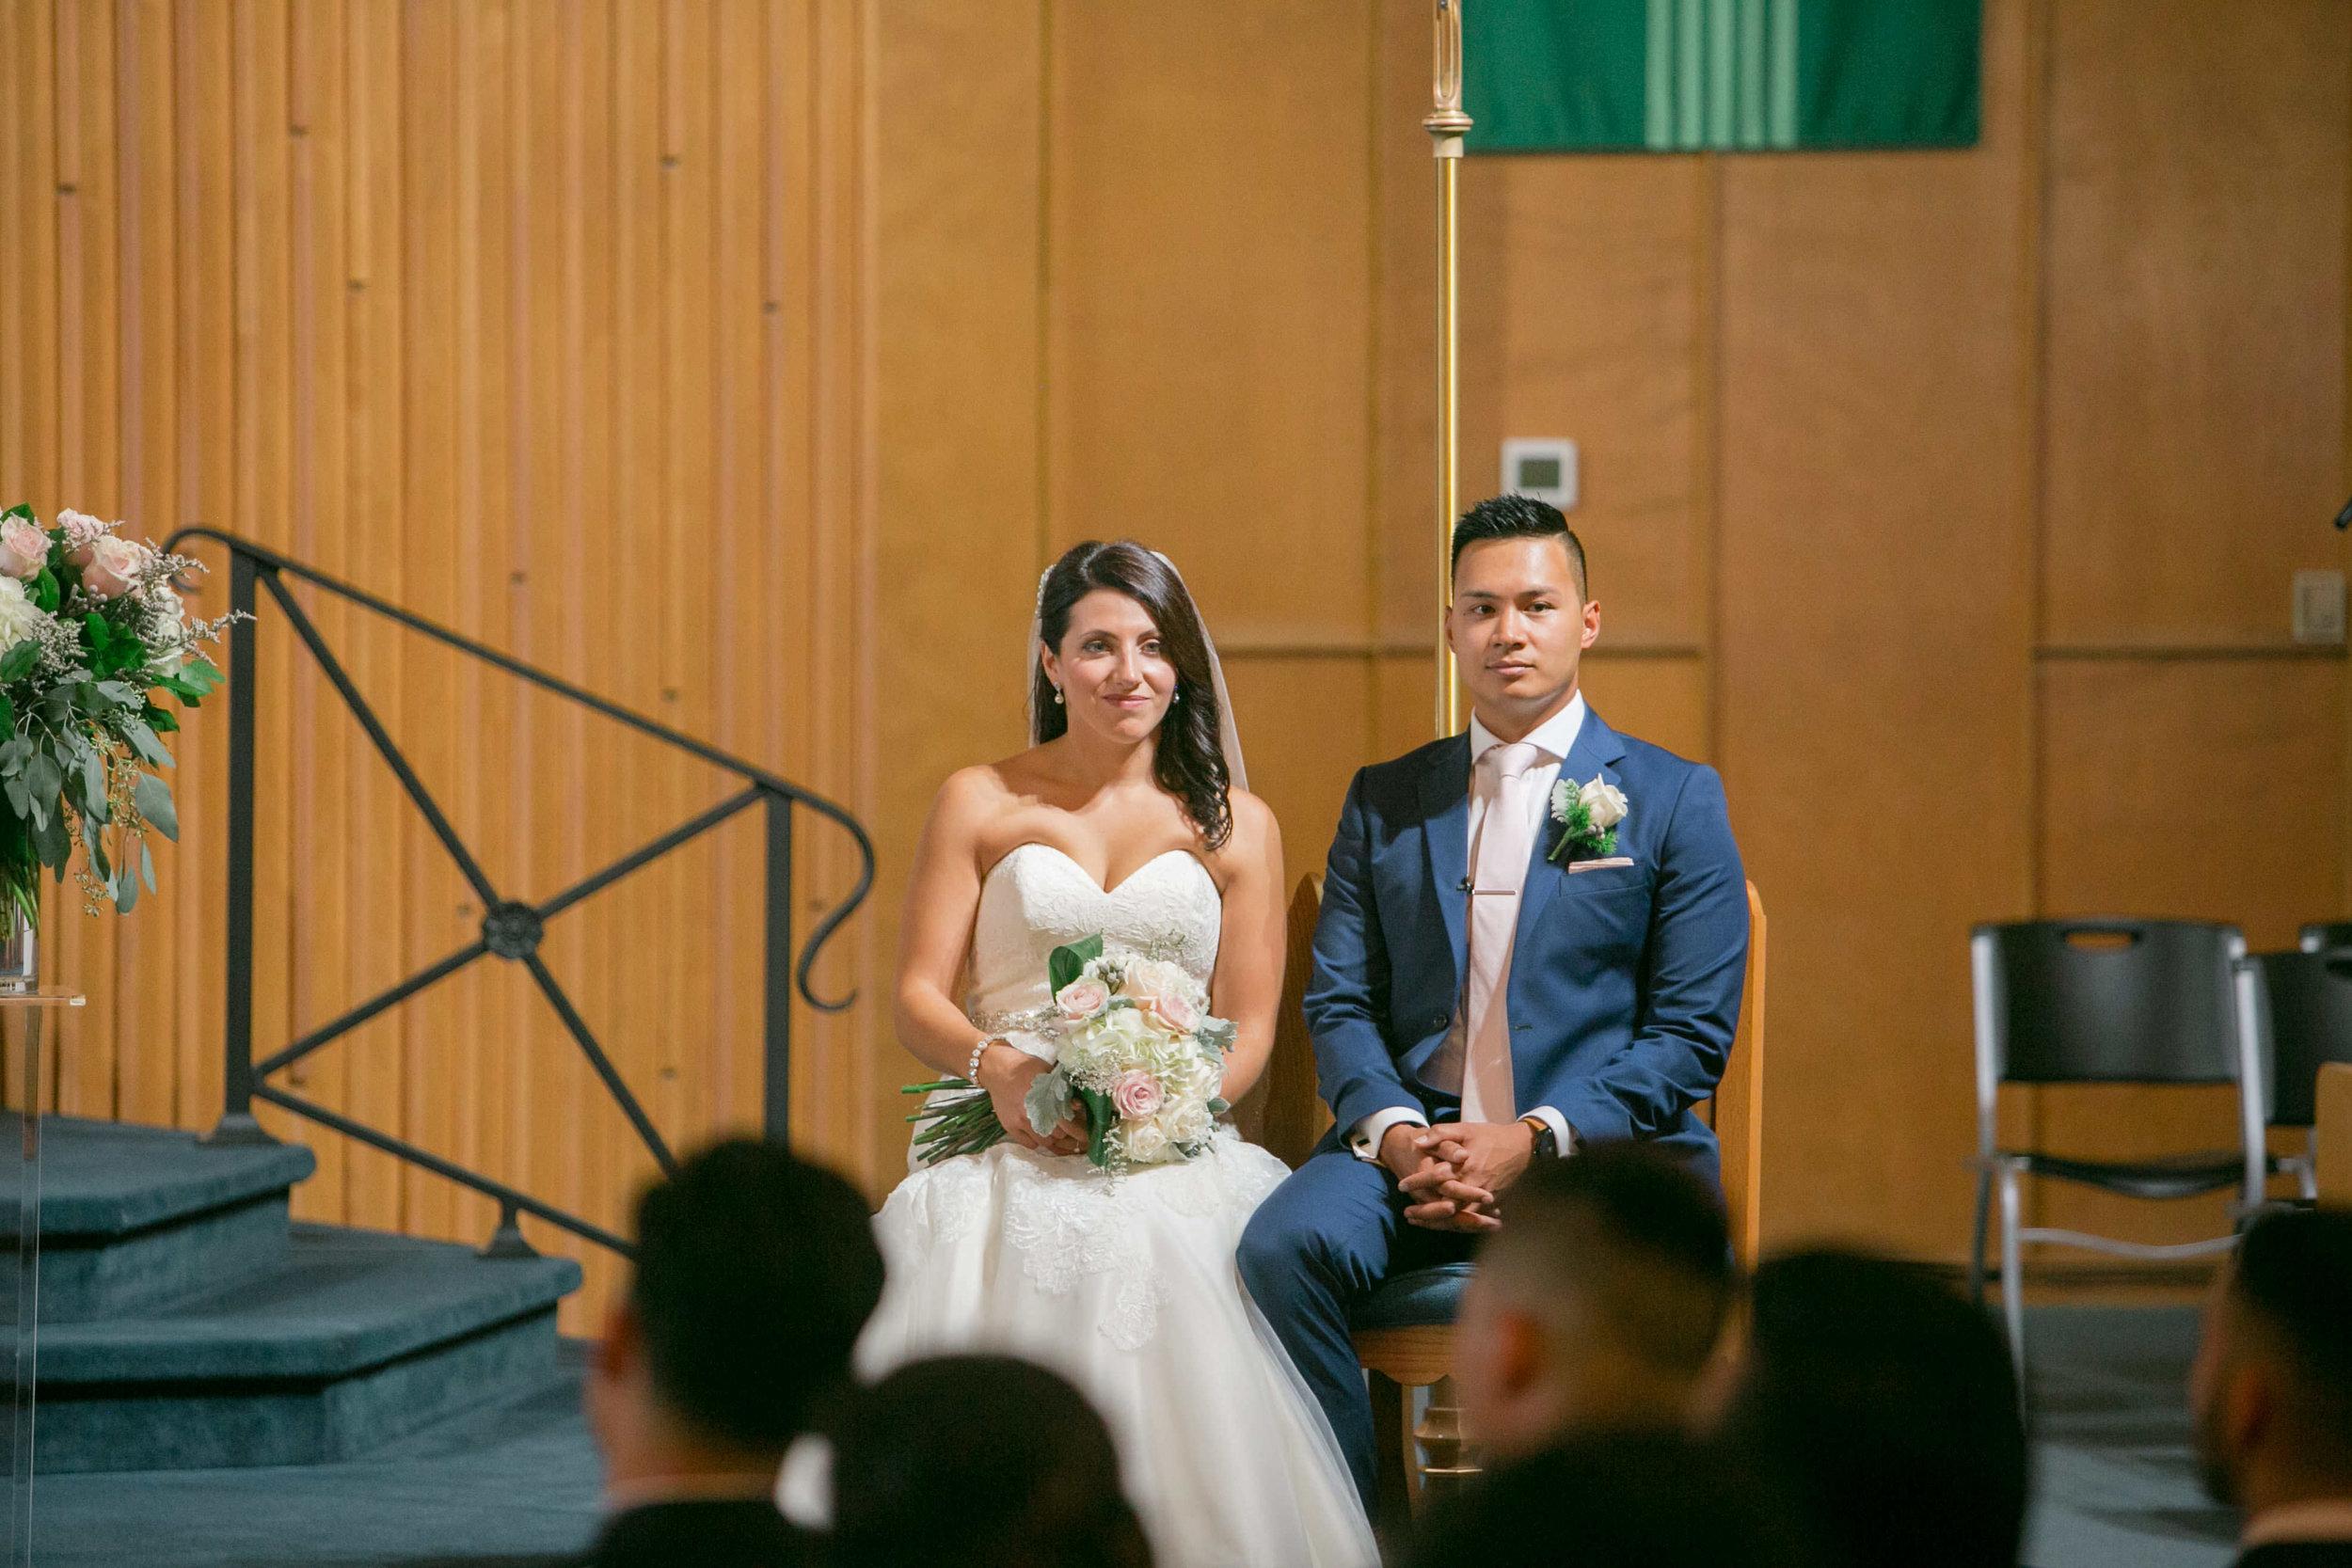 Stefanie___Bernard___Daniel_Ricci_Weddings_High_Res._Finals__235.jpg